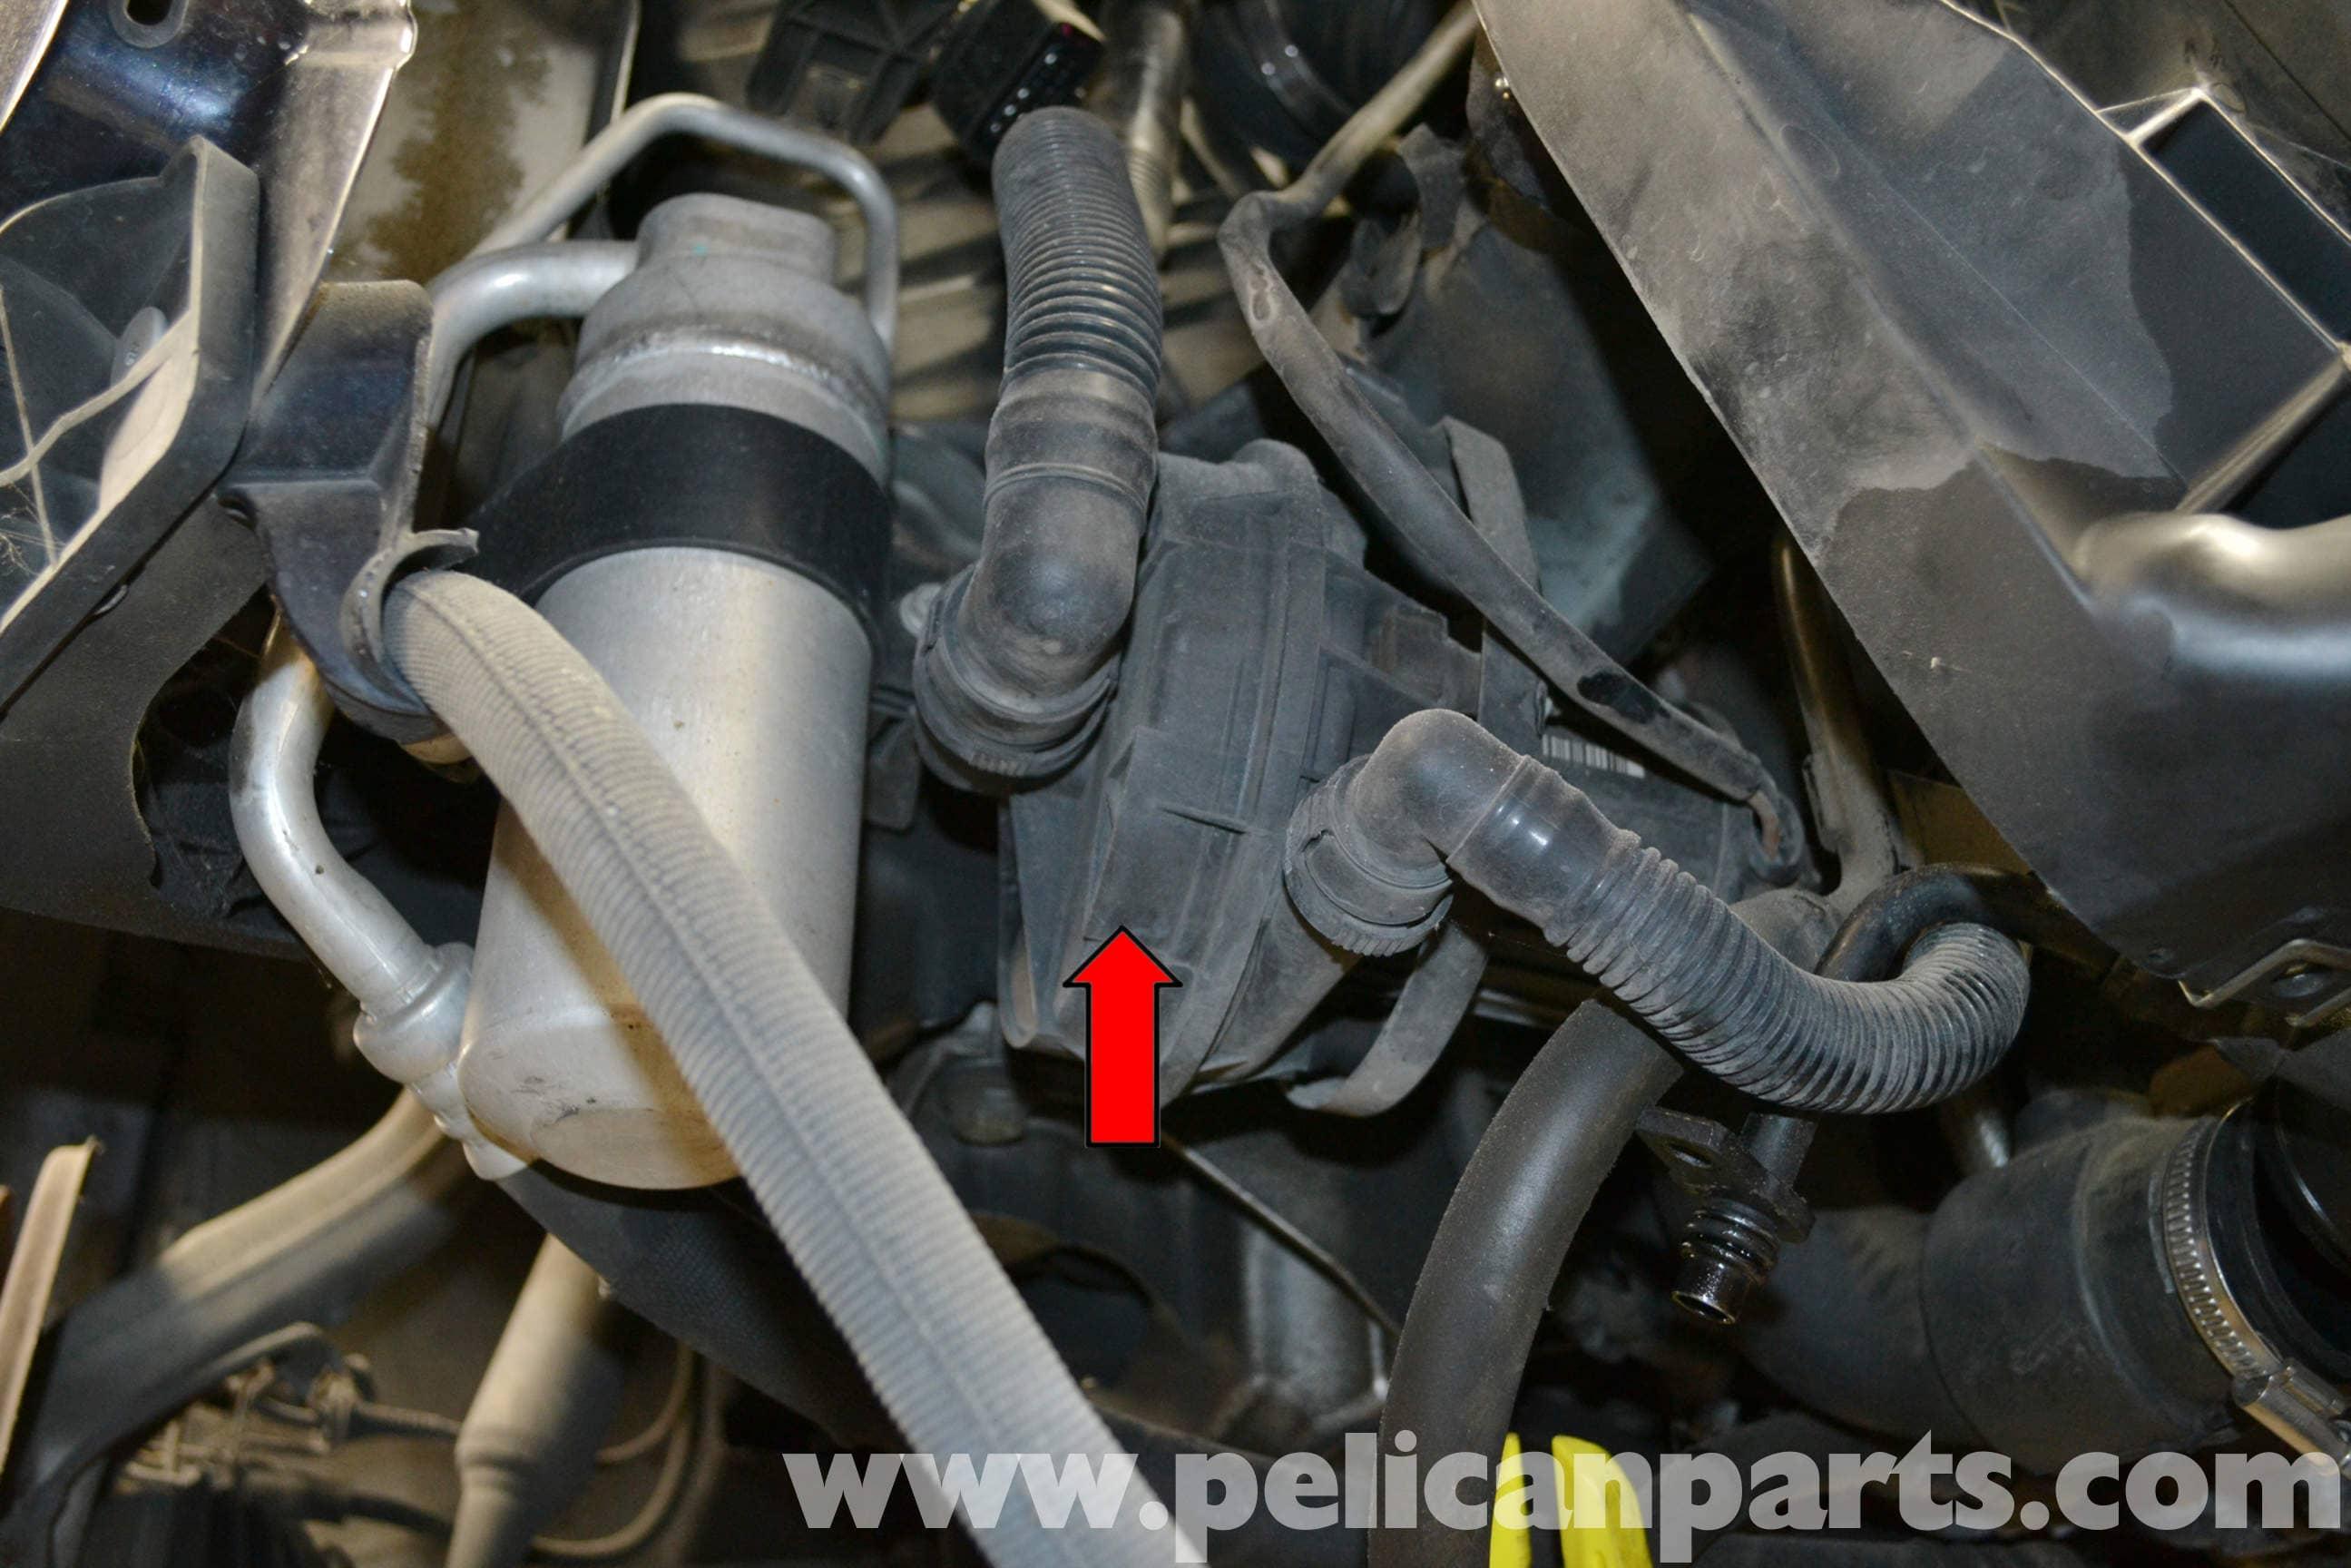 2000 Vw Jetta Vr6 Wiring Diagram Schematic Audi A4 B6 Fixing Common Vacuum Leaks 2002 2008